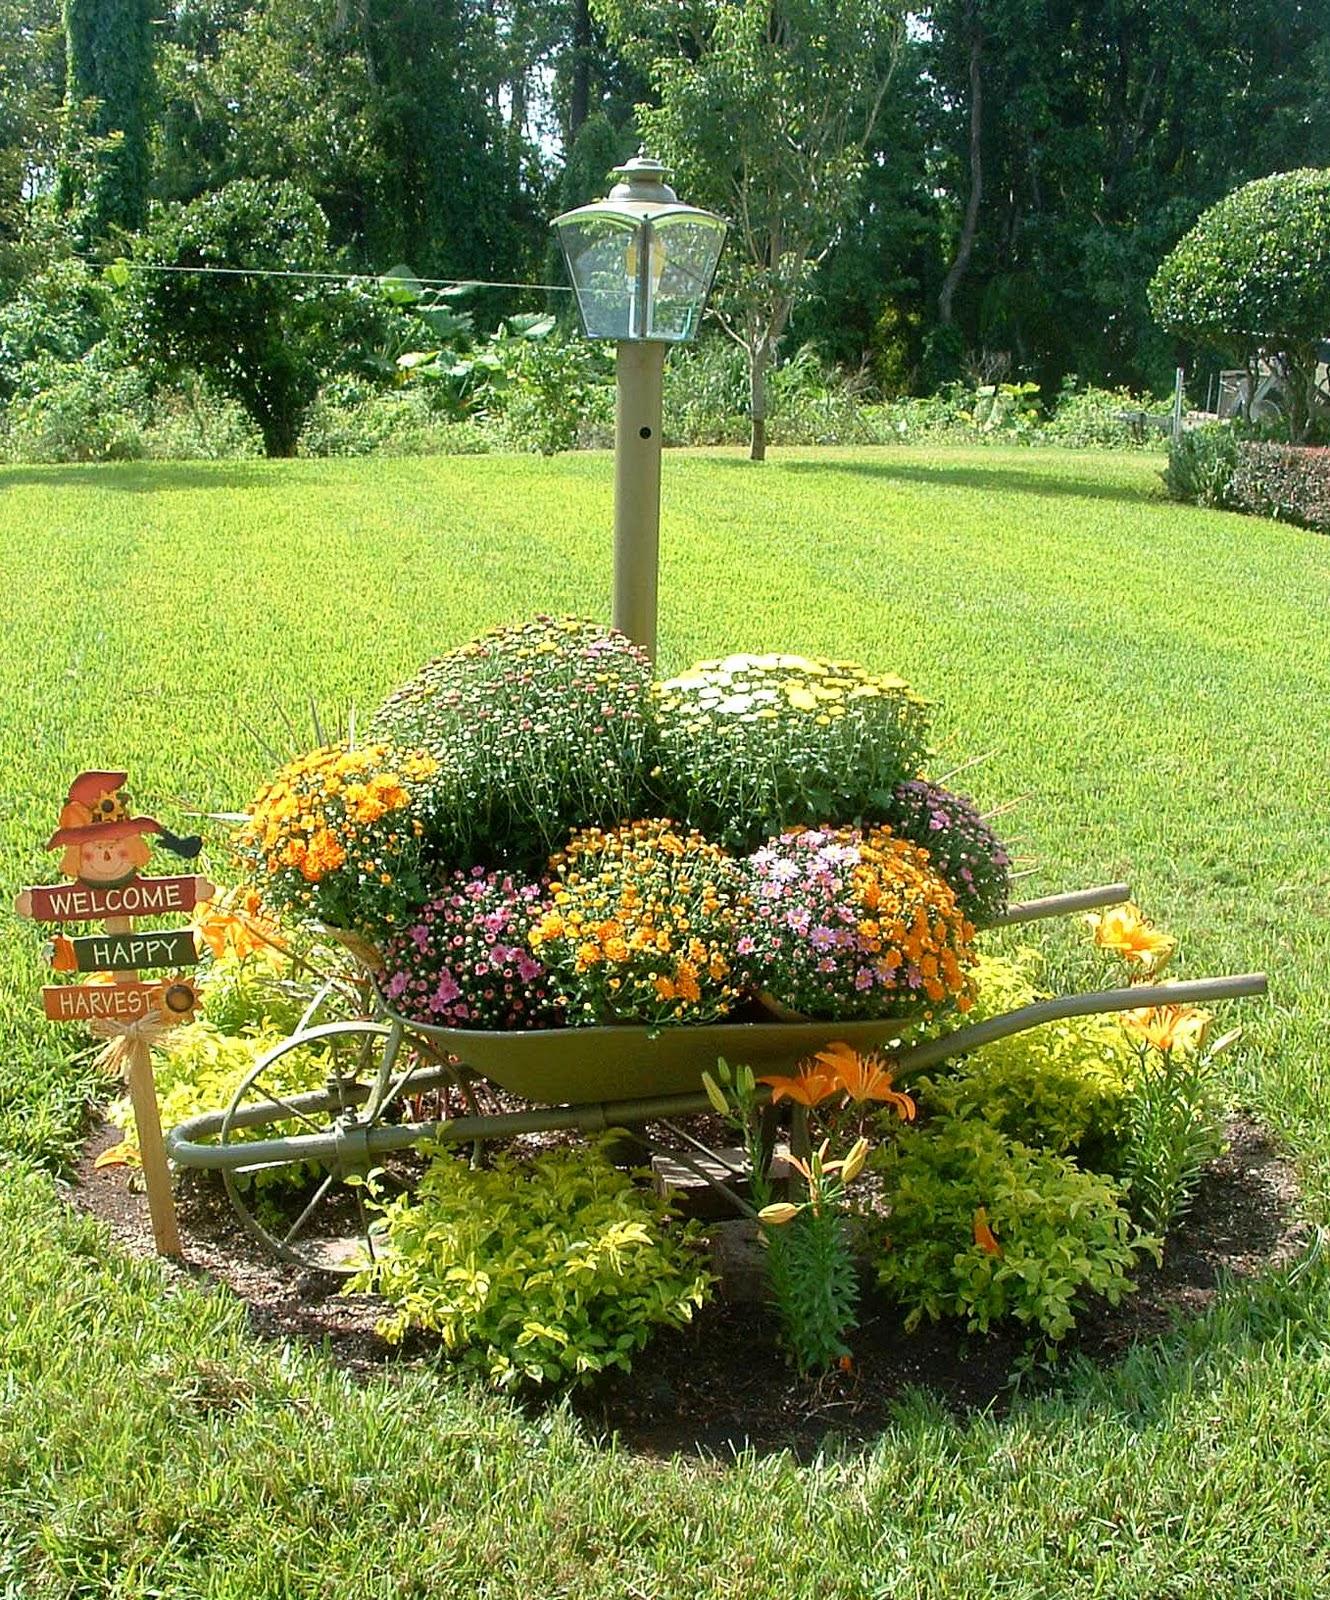 Decora Interi : Jardins coloridos e reciclados #A67025 1330x1600